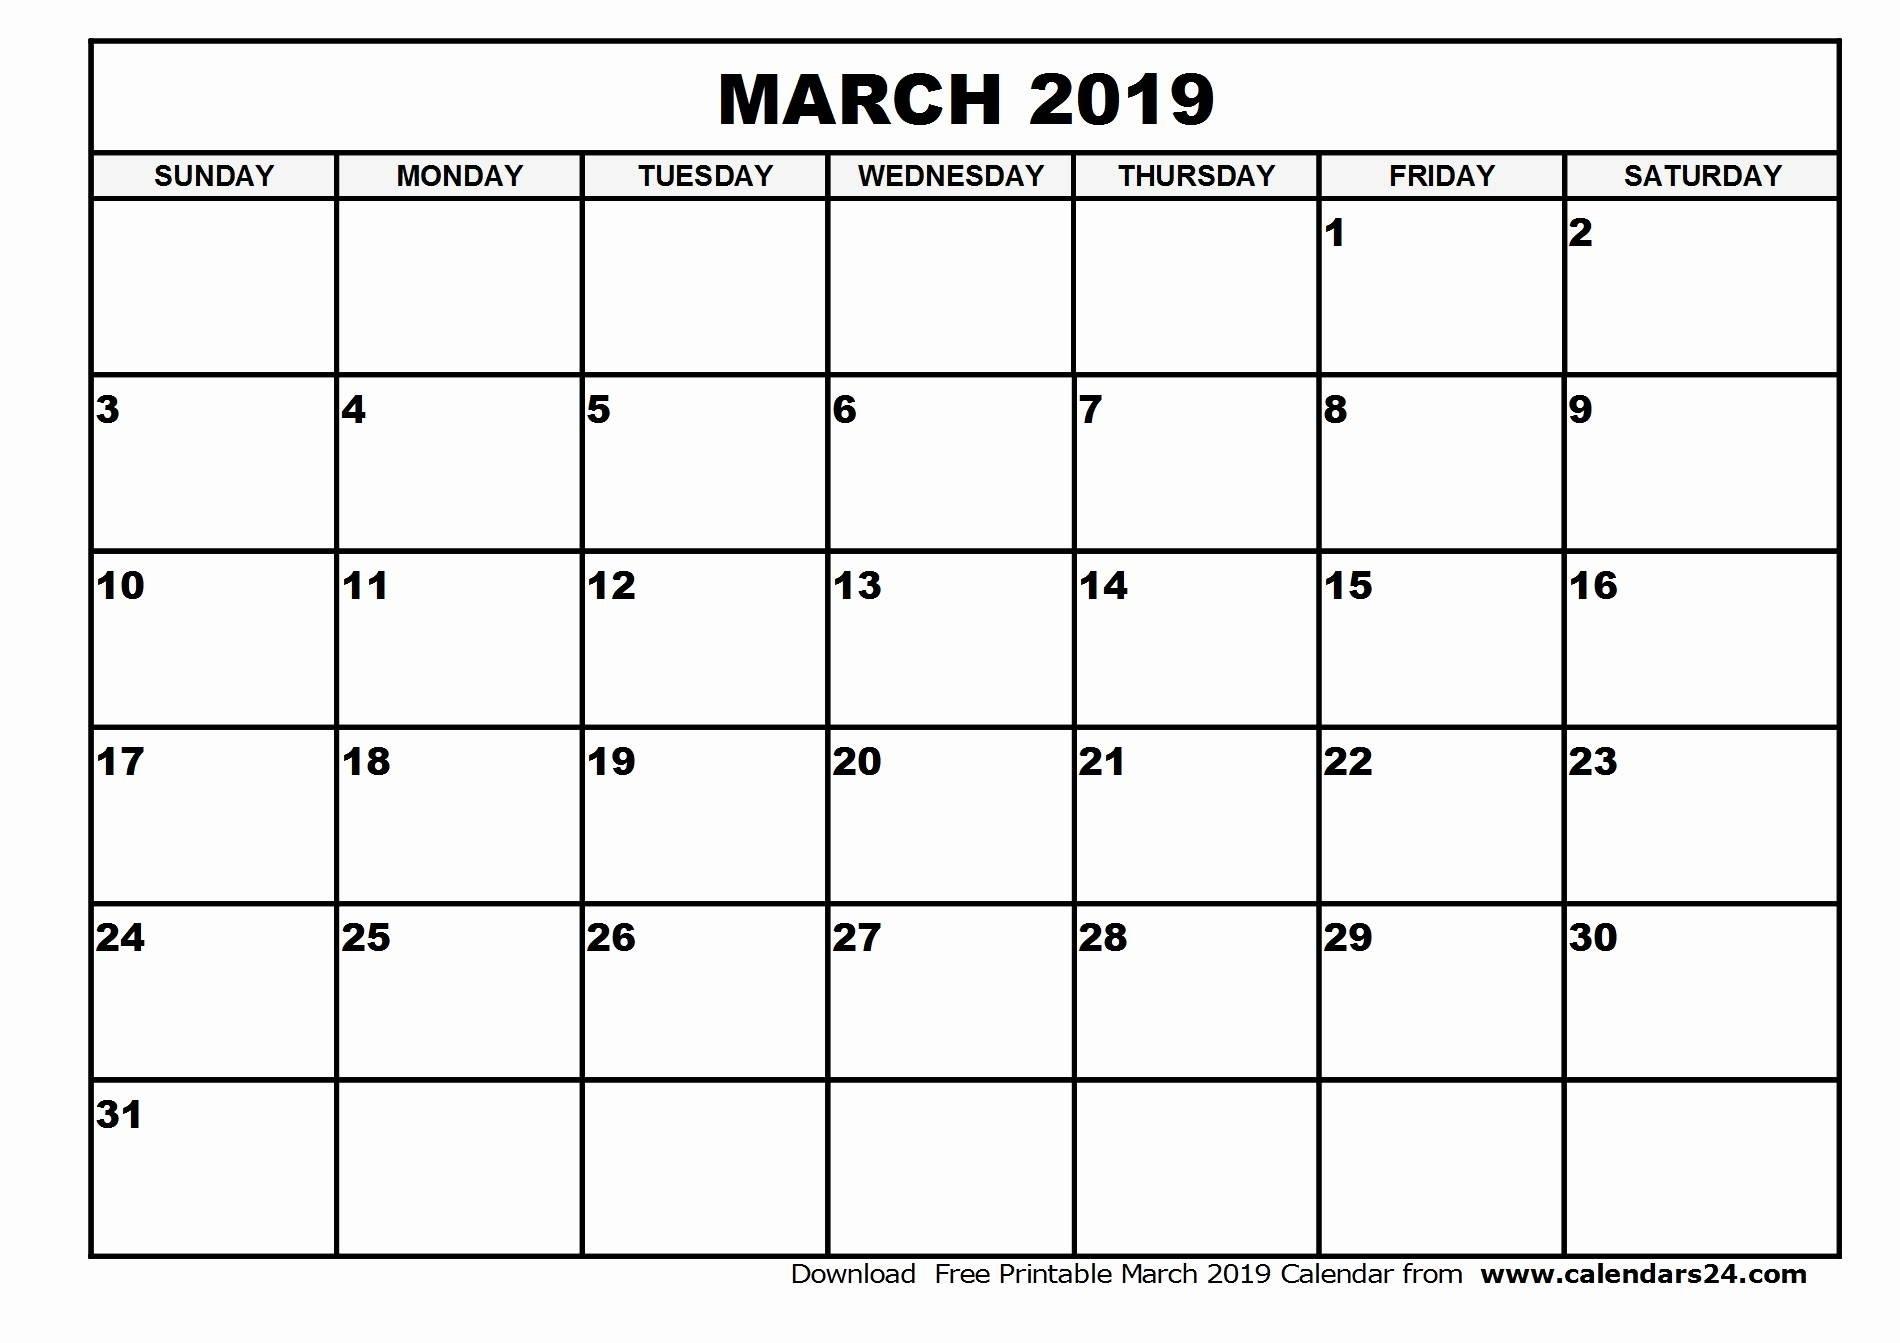 020 Free Printable Blank Calendar Template Monthly Templates intended for Free Printable Blank Monthly Calendar 2019